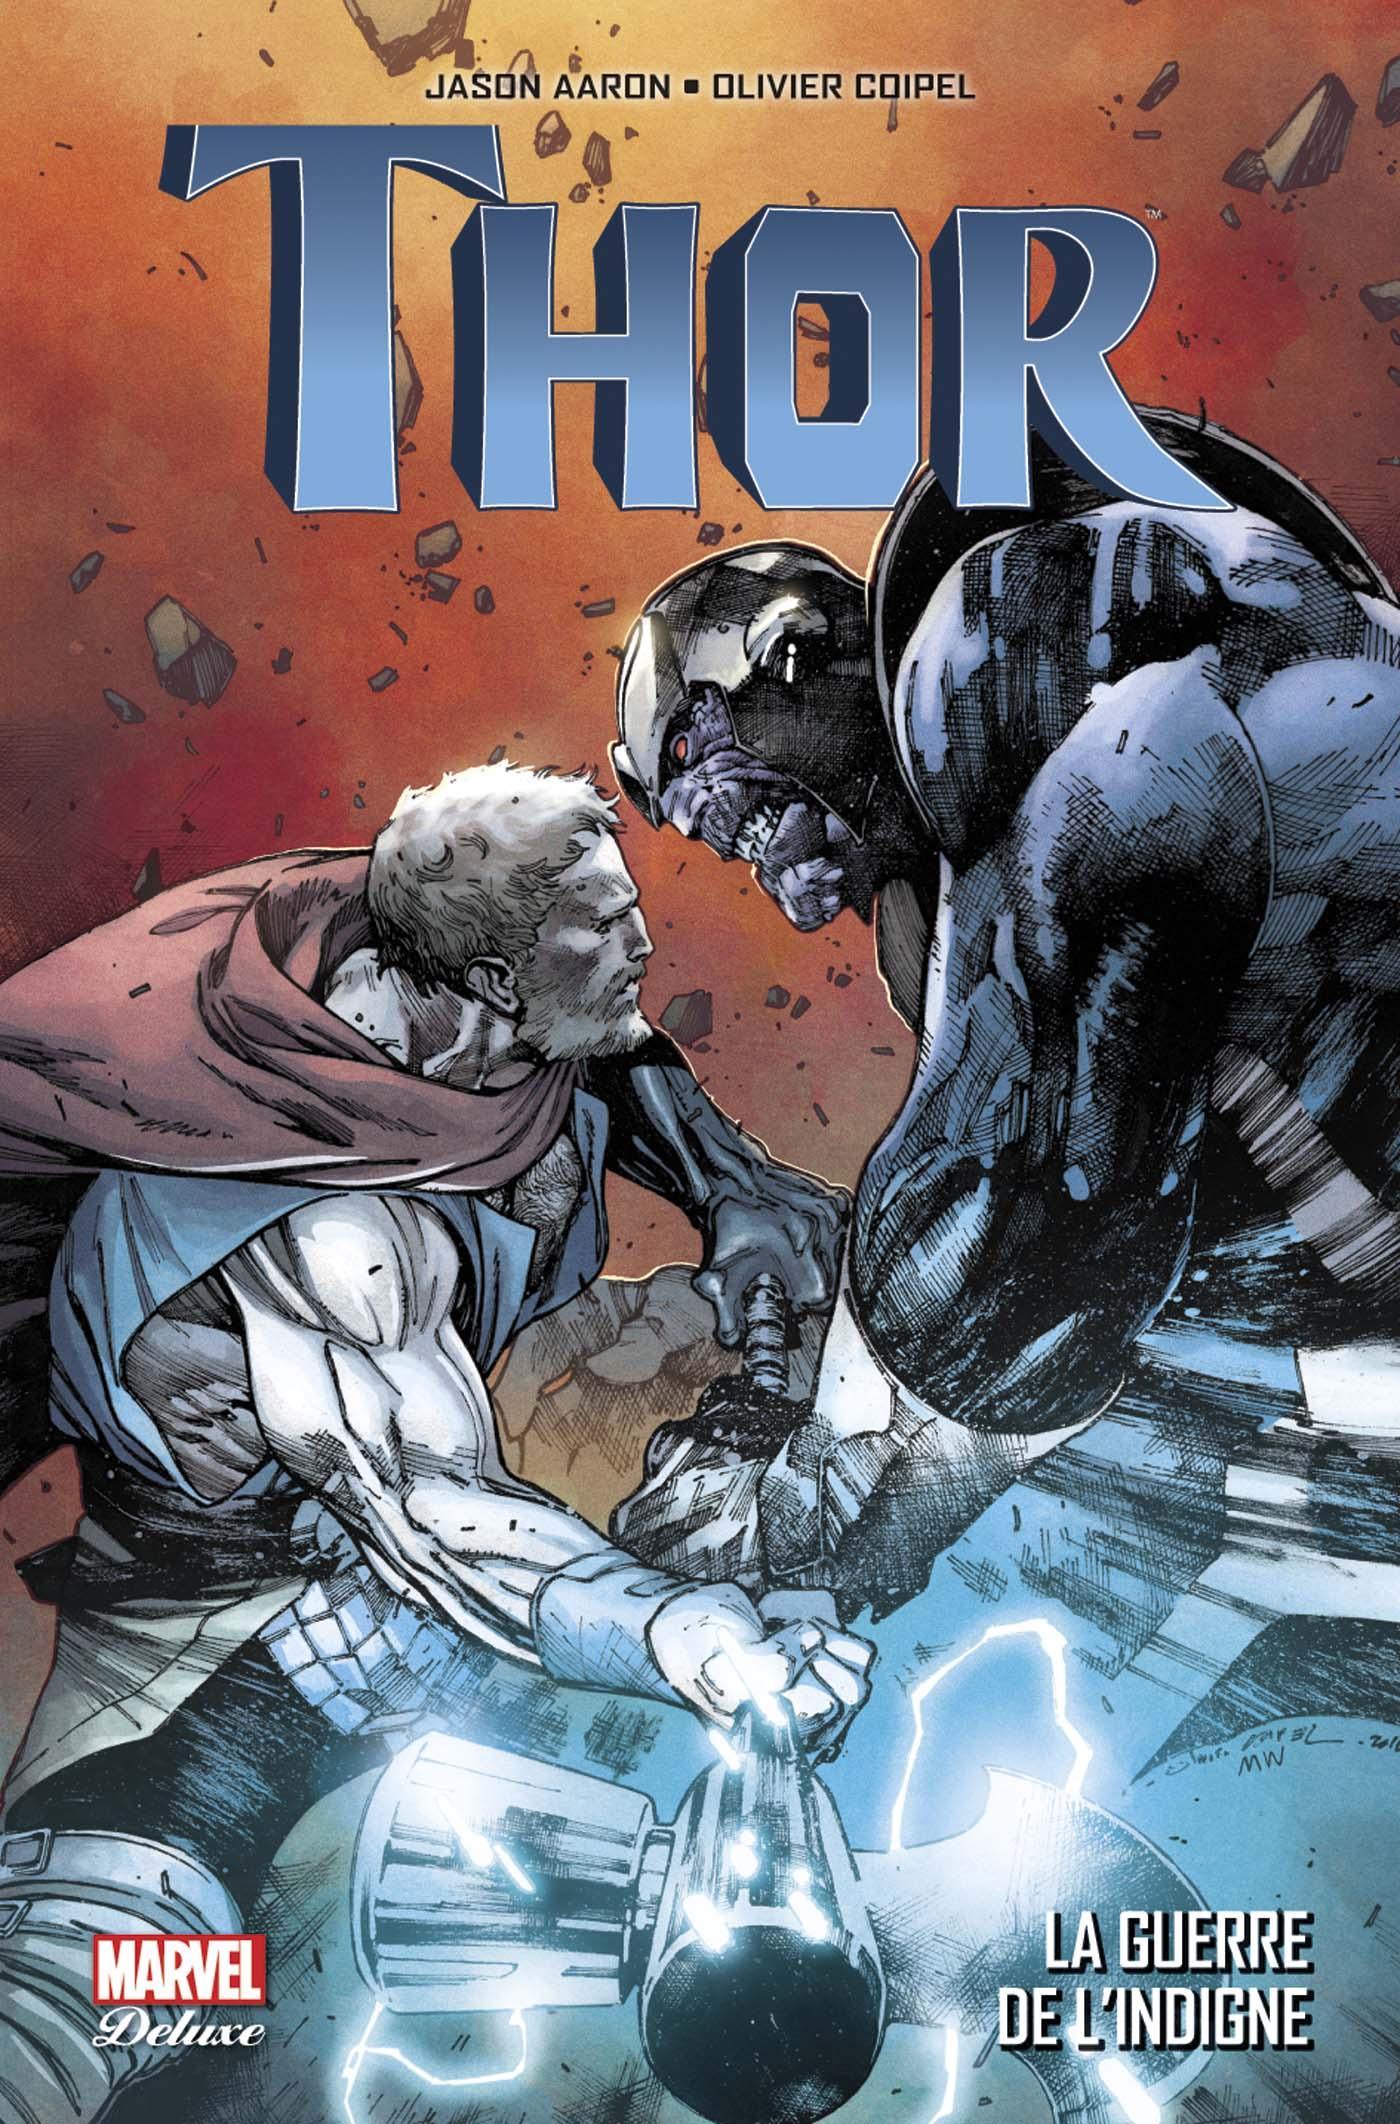 Thor - La guerre de l indigne 1 - LA GUERRE DE L'INDIGNE